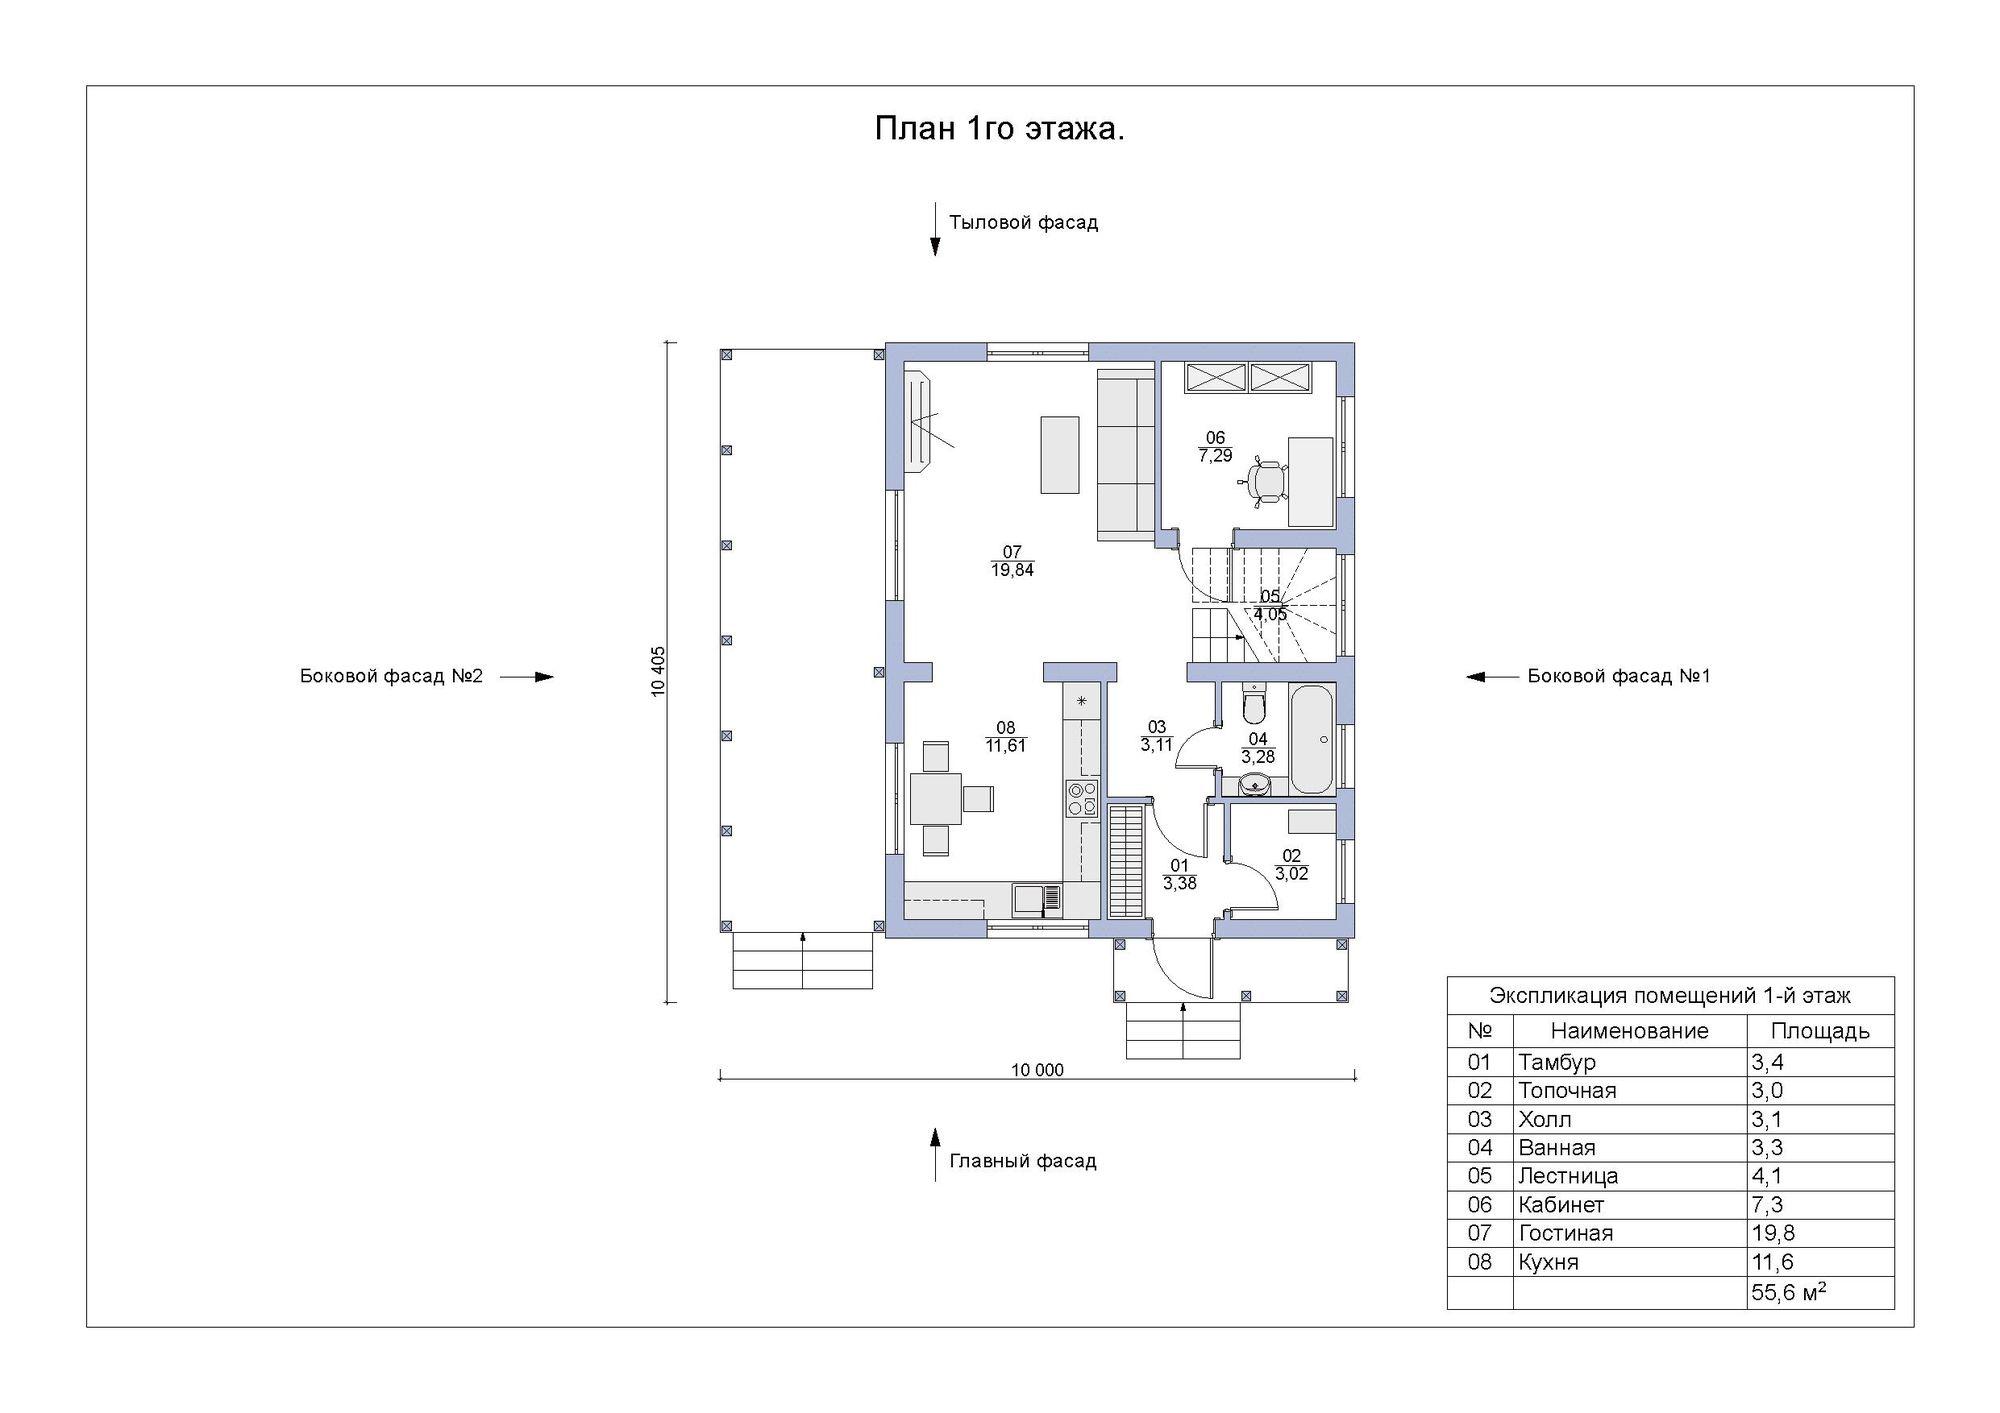 Дельта - План 1го этажа